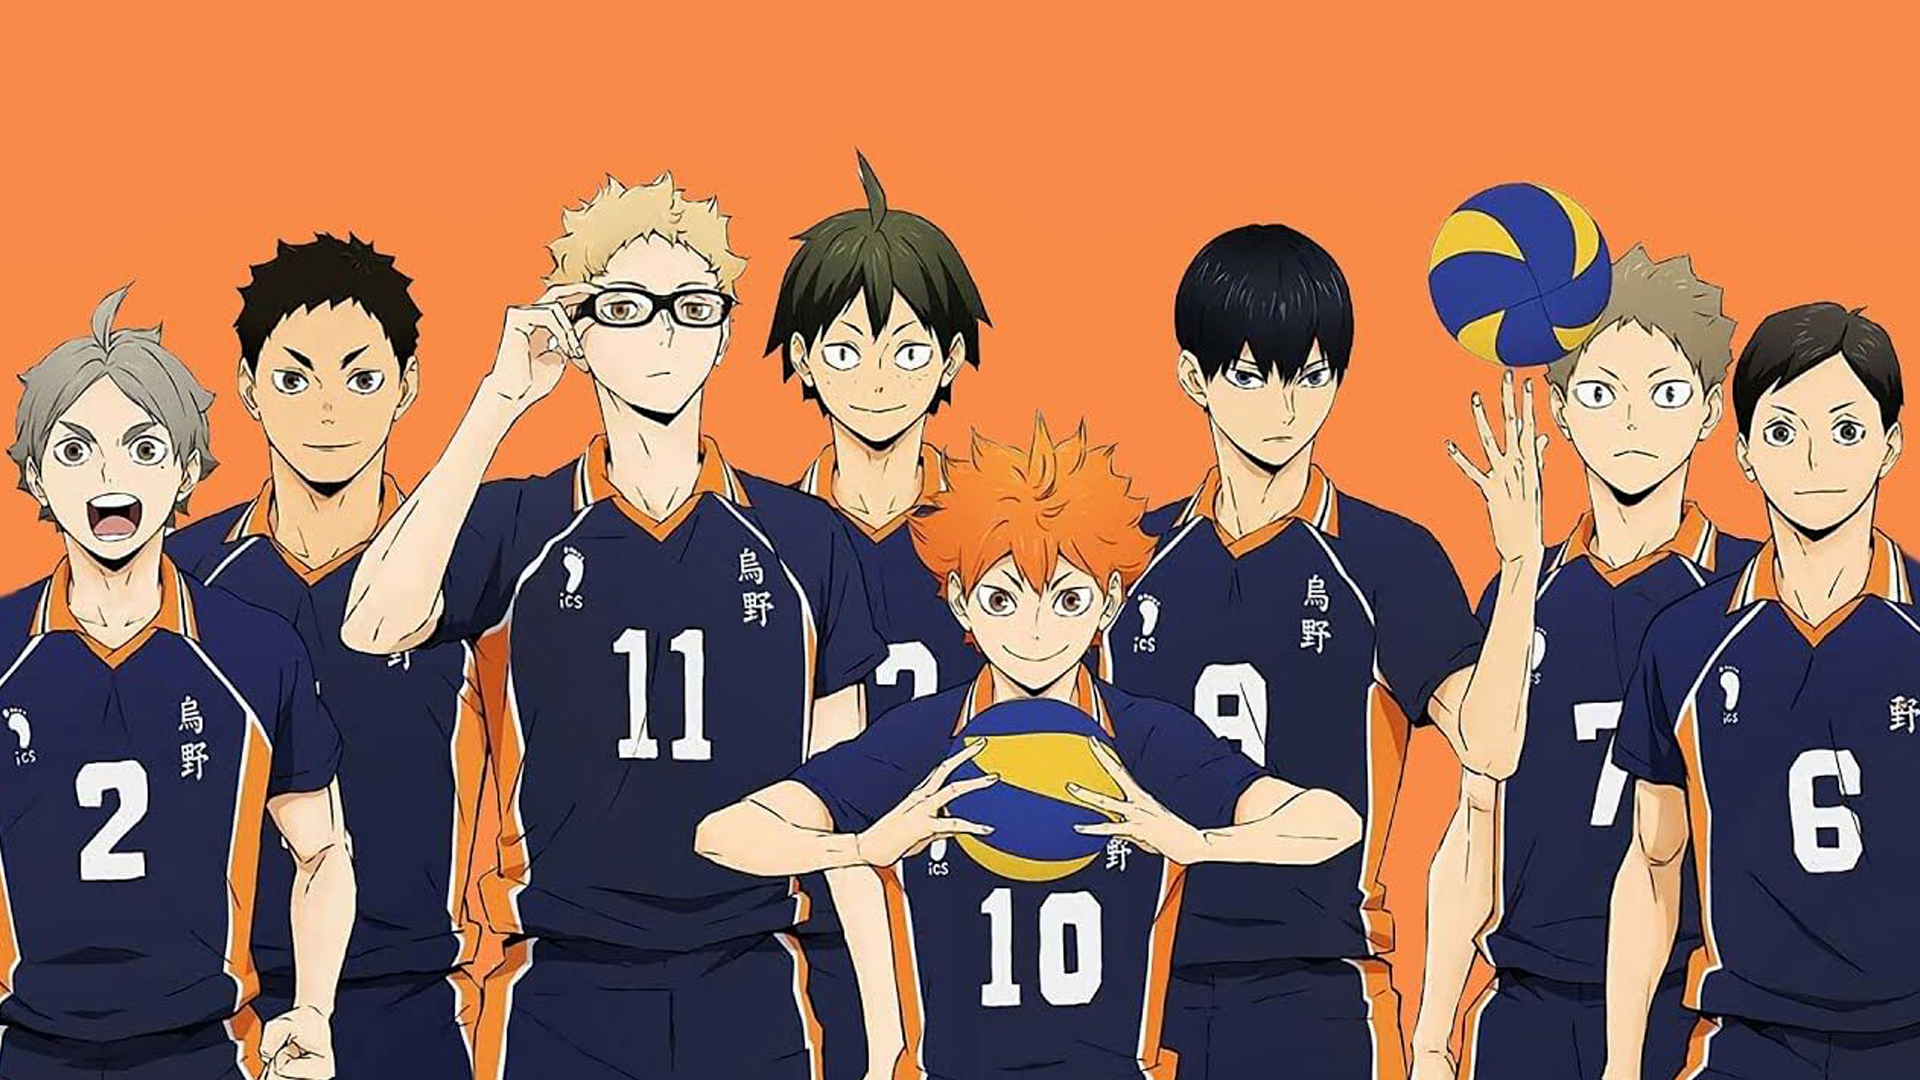 Anime football team with an orange background